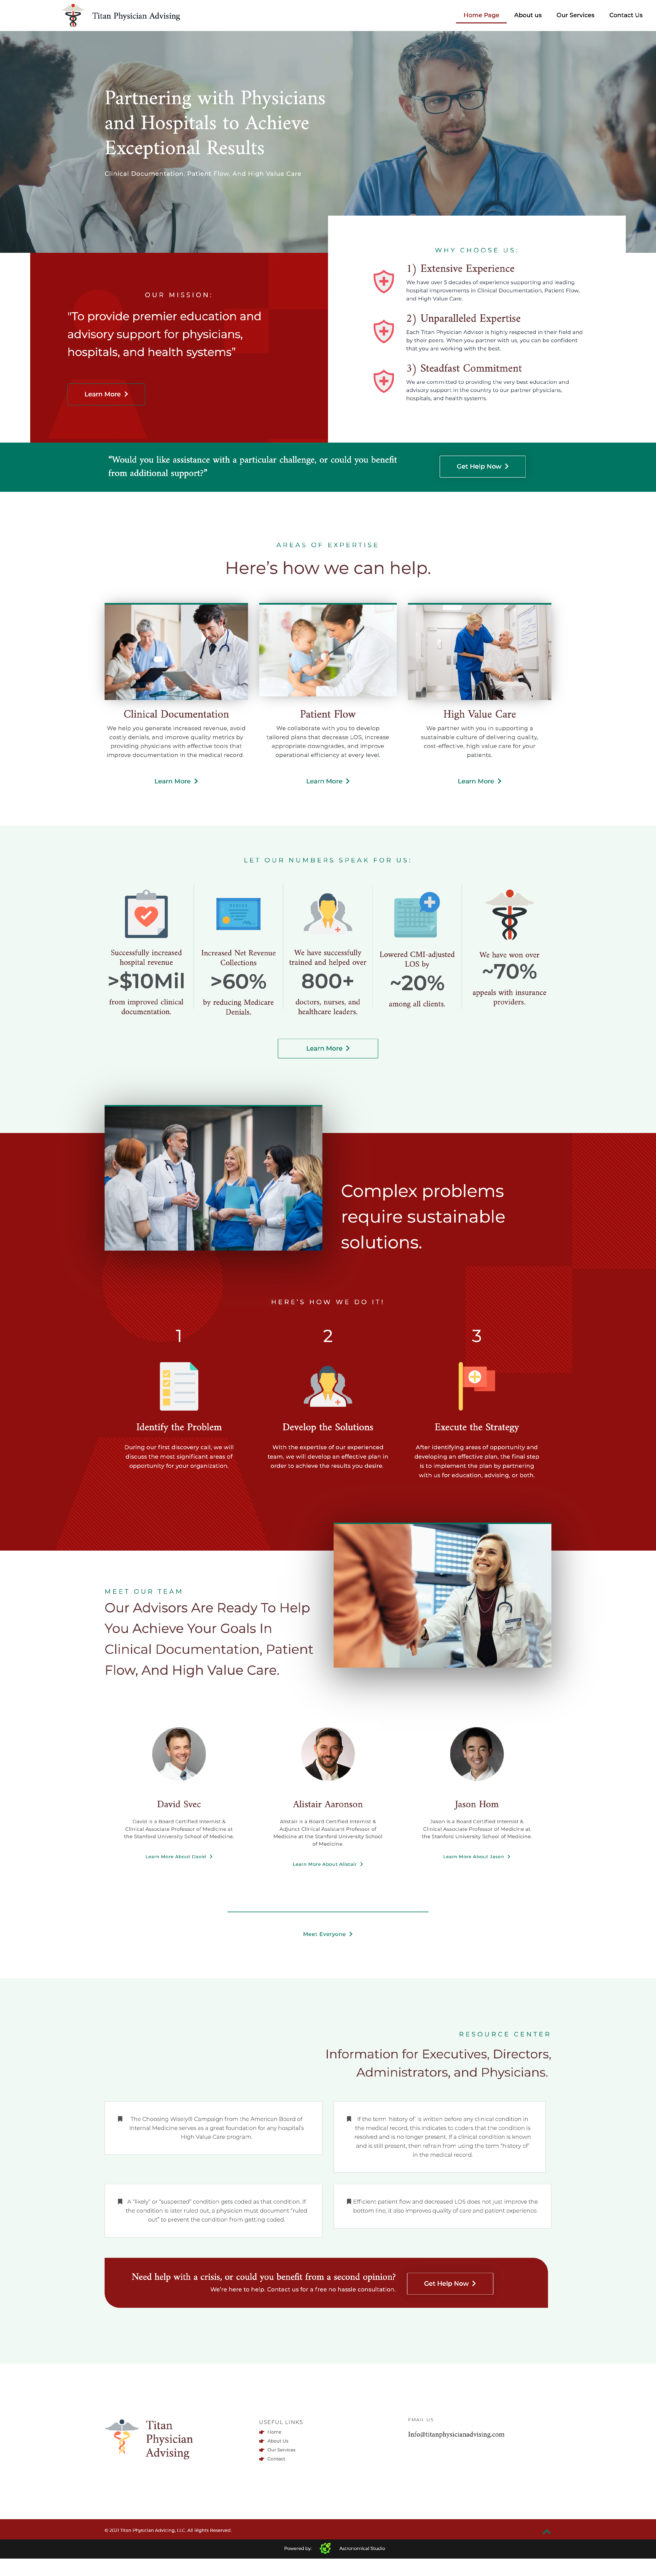 Titan-Physician-Website-Design-By-Astronomical-Studio